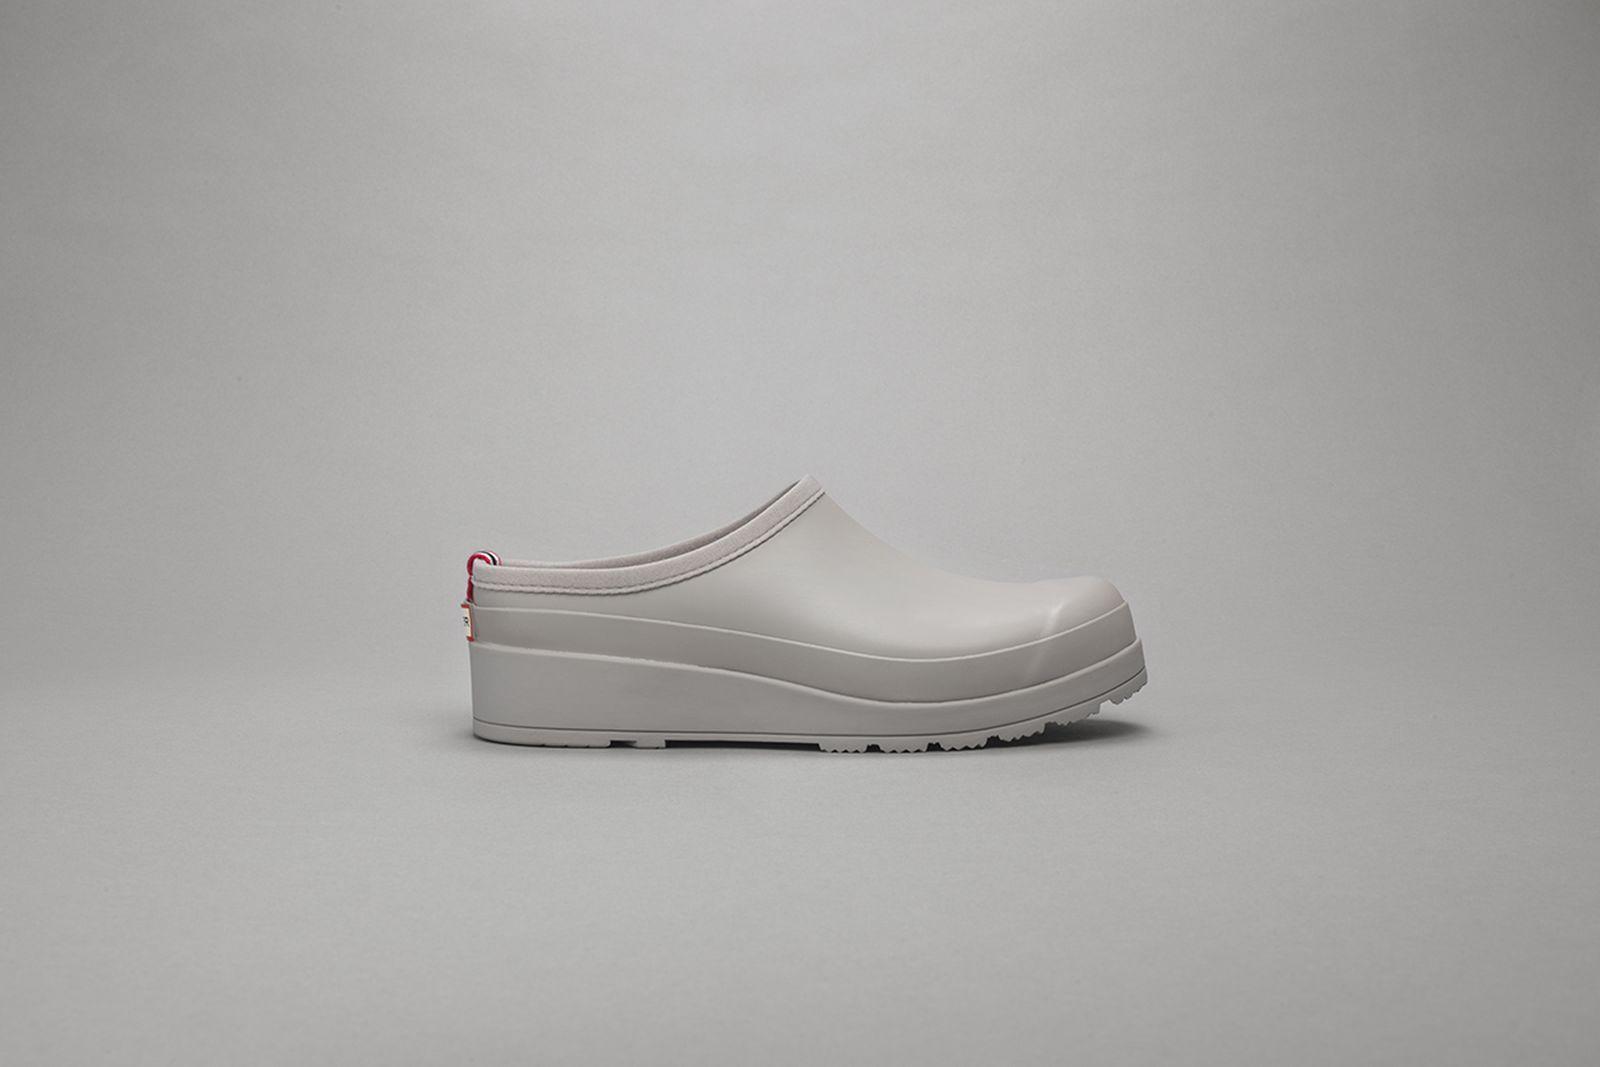 pharrell-adidas-hu-nmd-pink-release-info-3-02